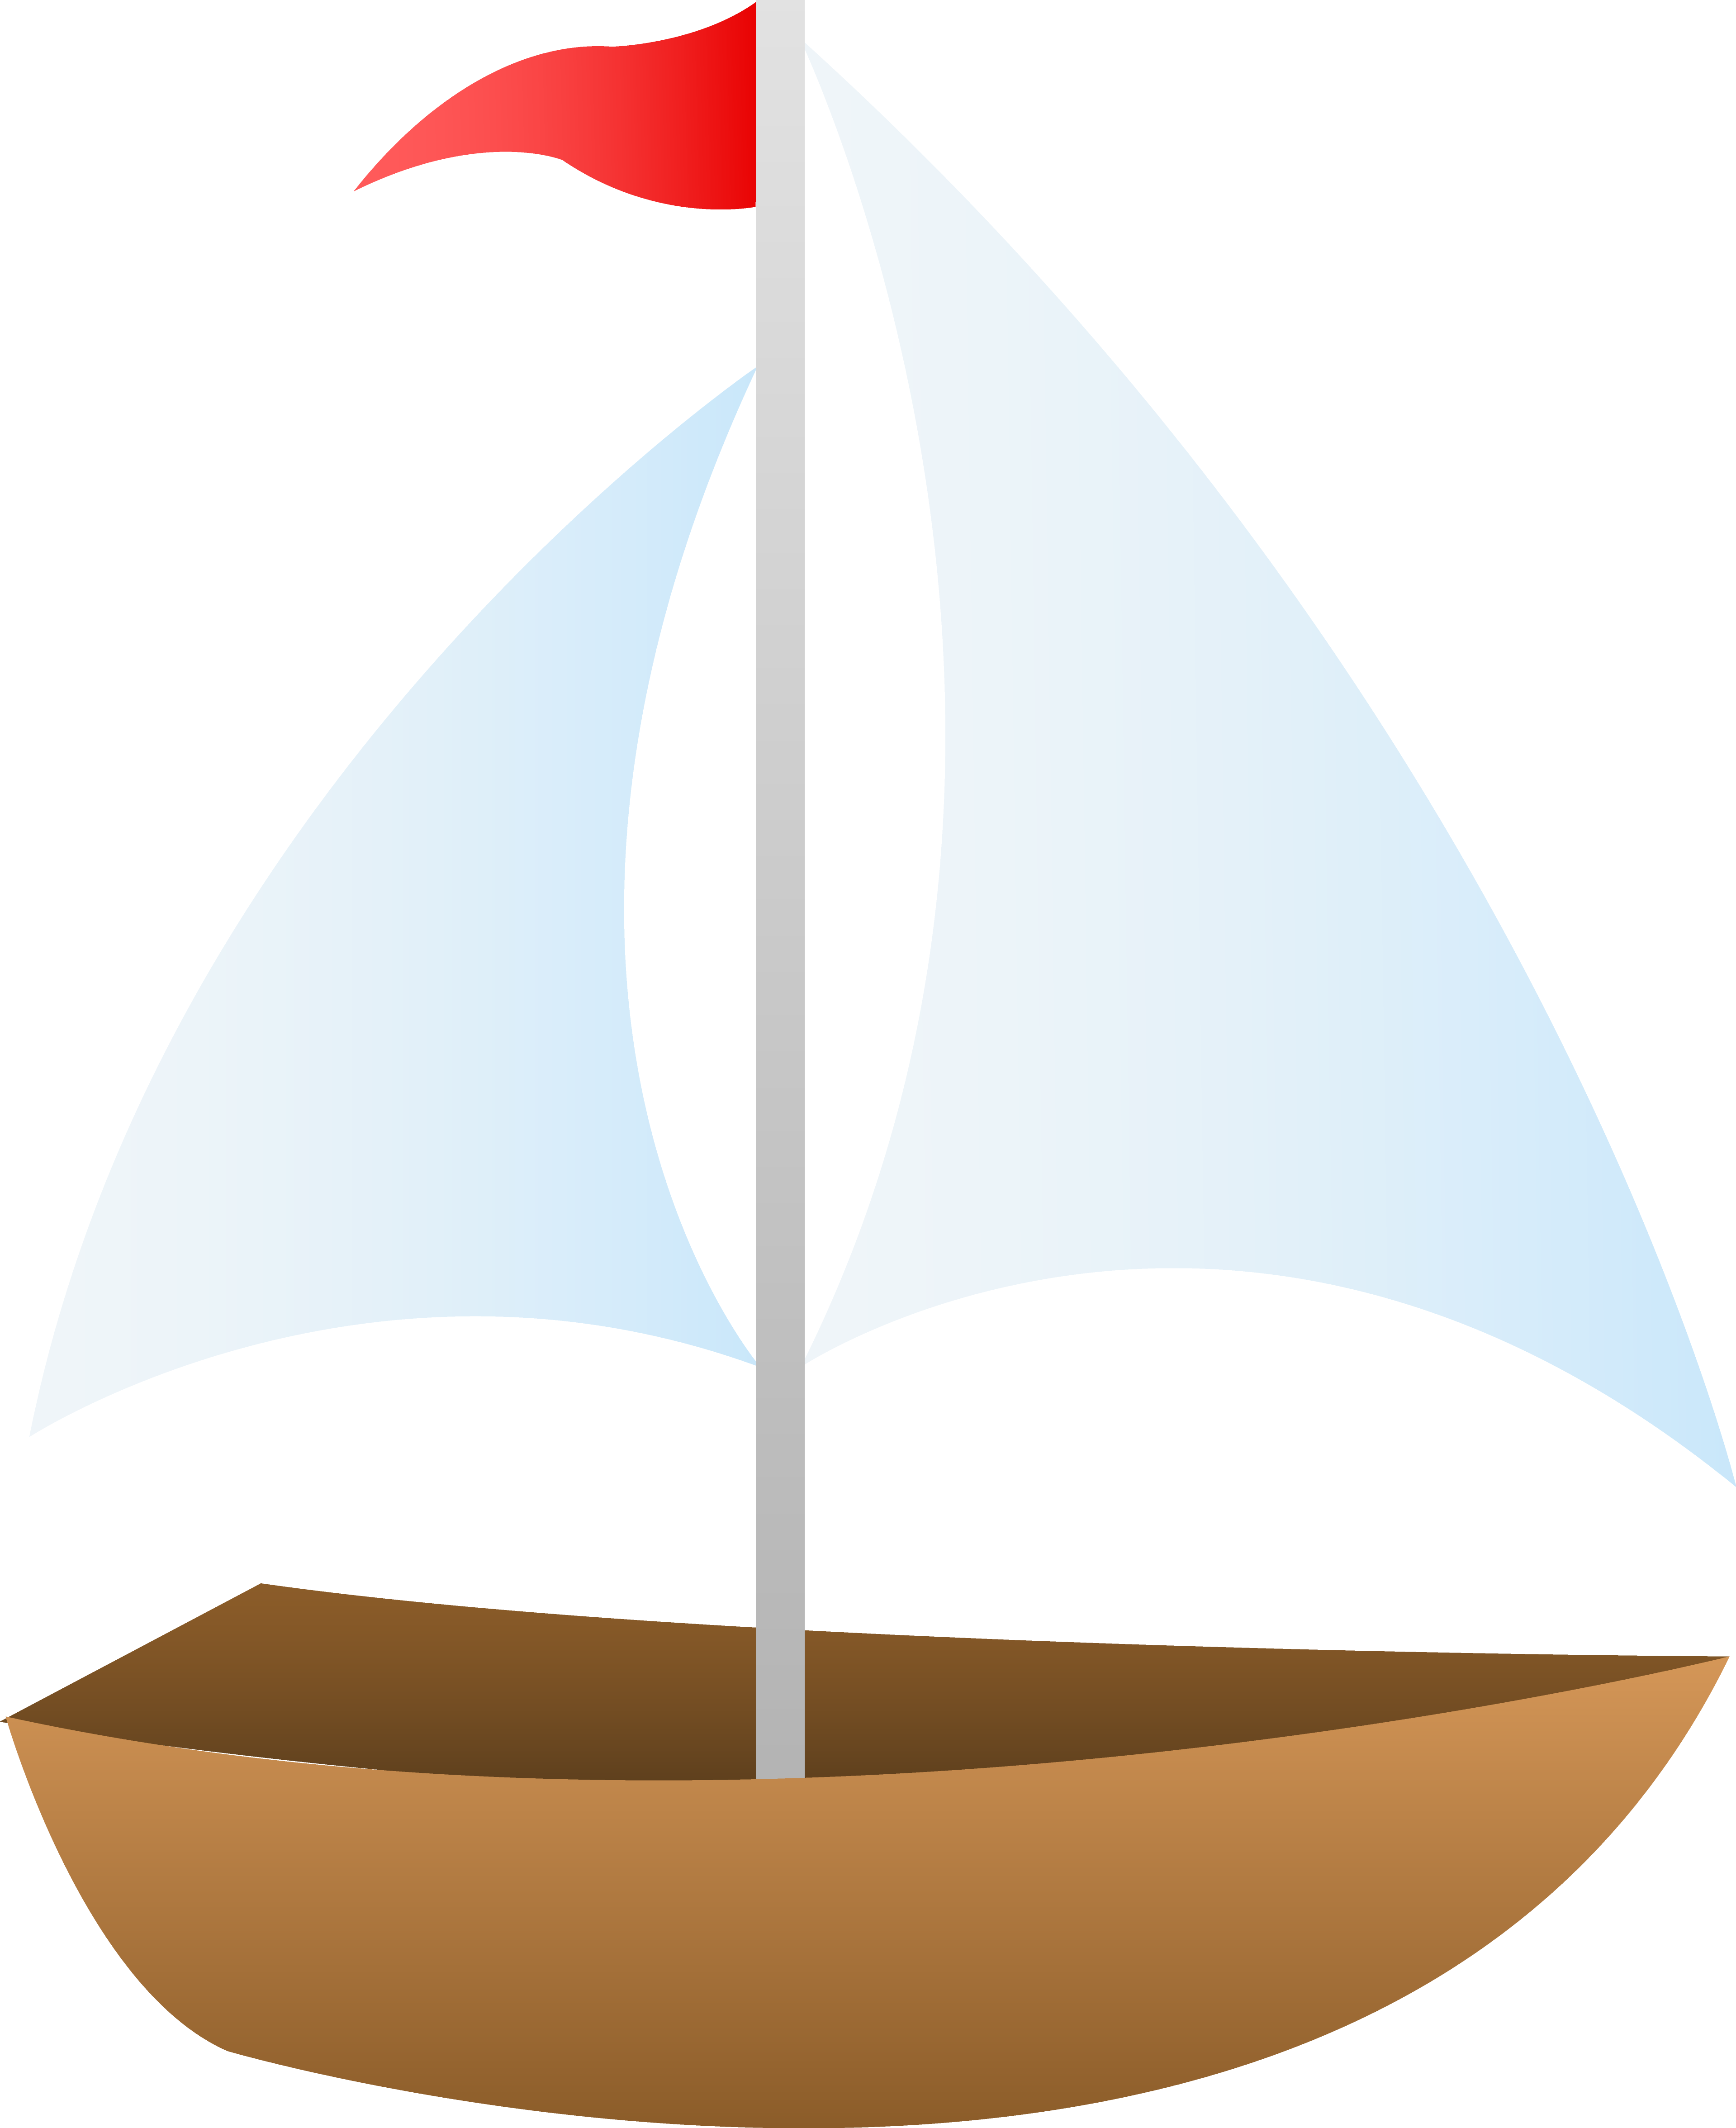 Sailboat clipart #2, Download drawings